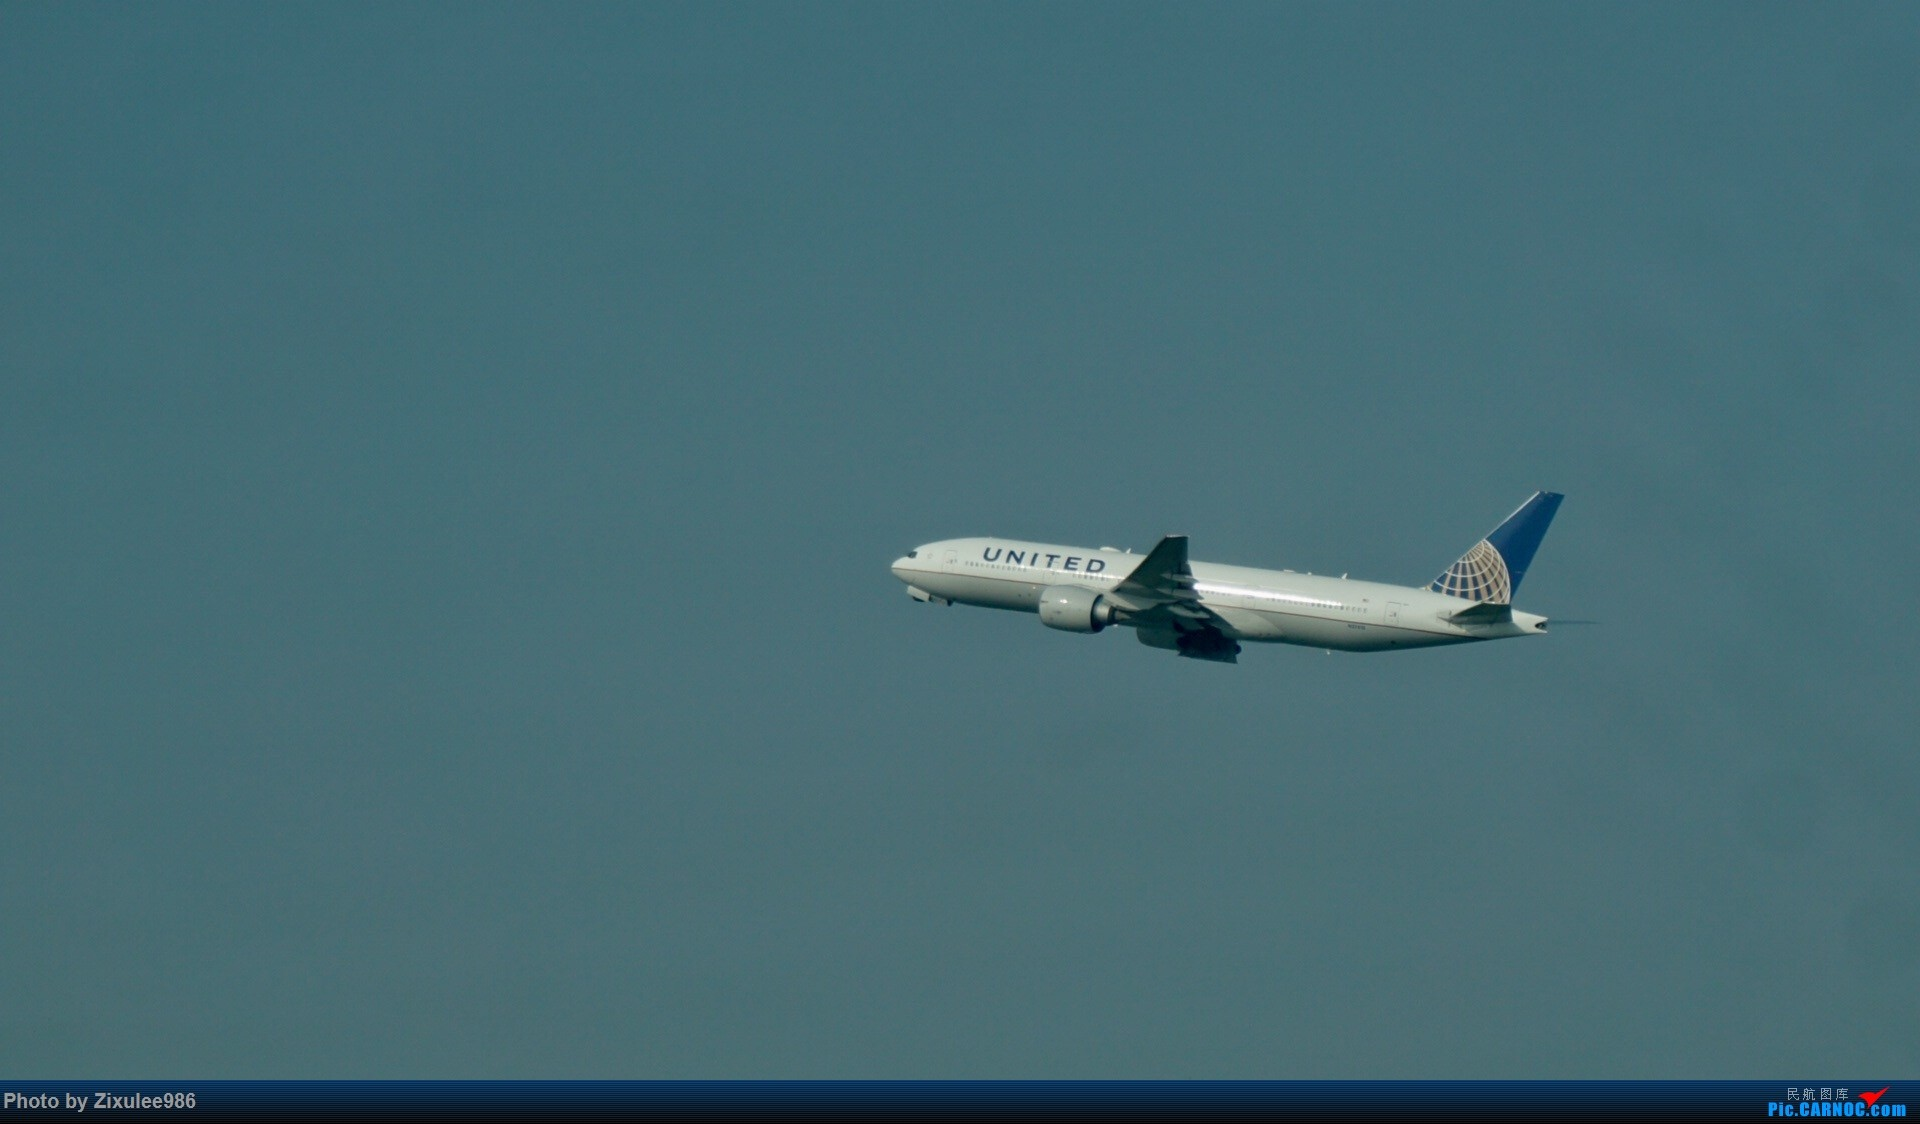 Re:[原创]加拿大21日游学之旅(一)~JJN-PVG-YYZ..(内含flightlog)~第一次发游记~多图缓更请谅解 BOEING 777-224(ER) N27015 中国上海浦东国际机场